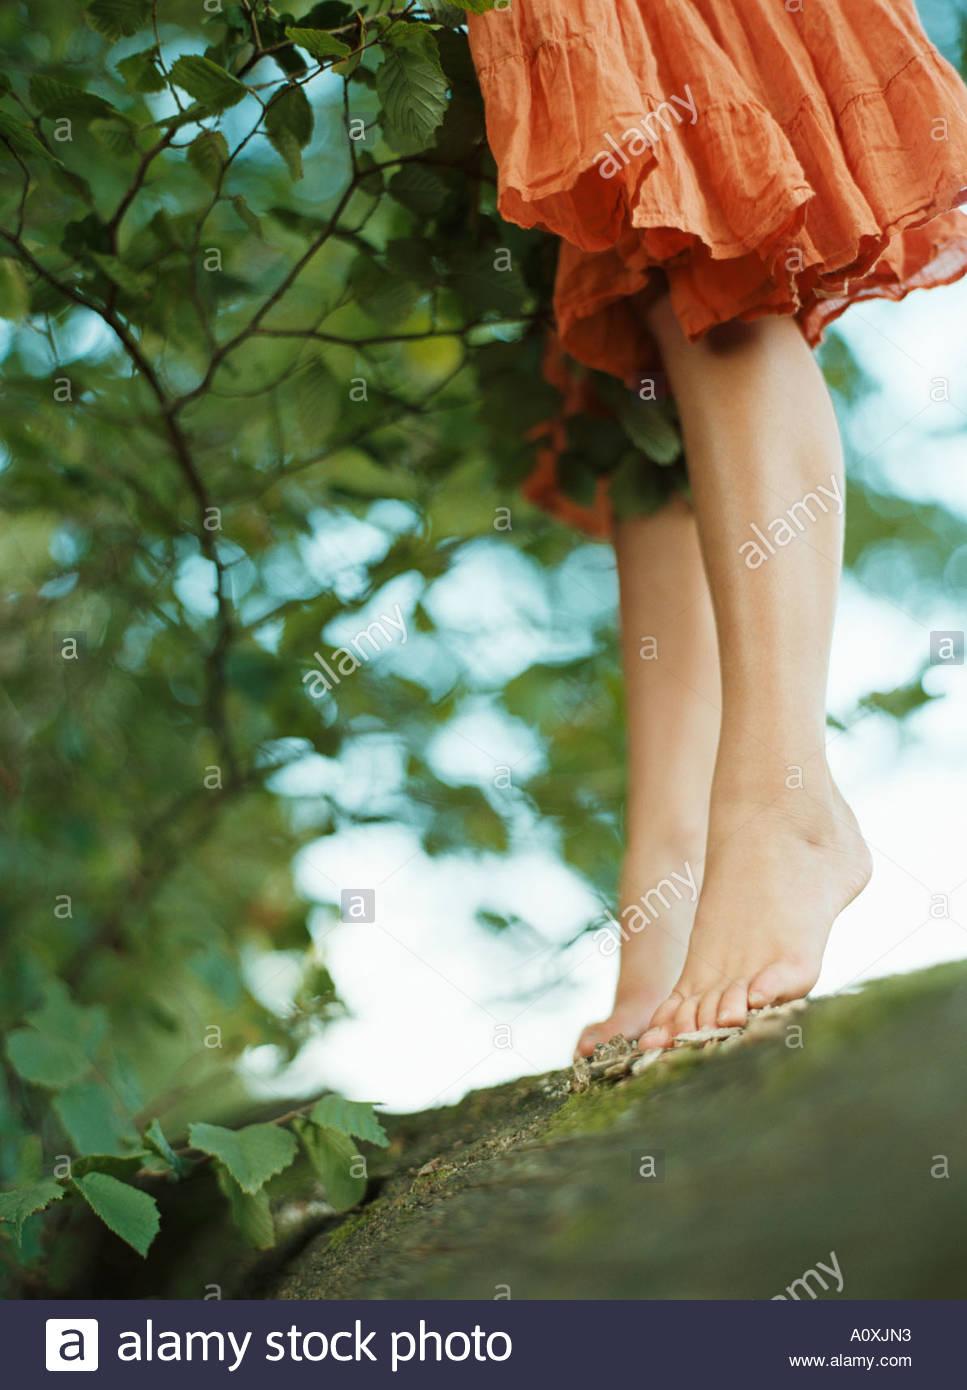 Girl standing barefoot on a log - Stock Image